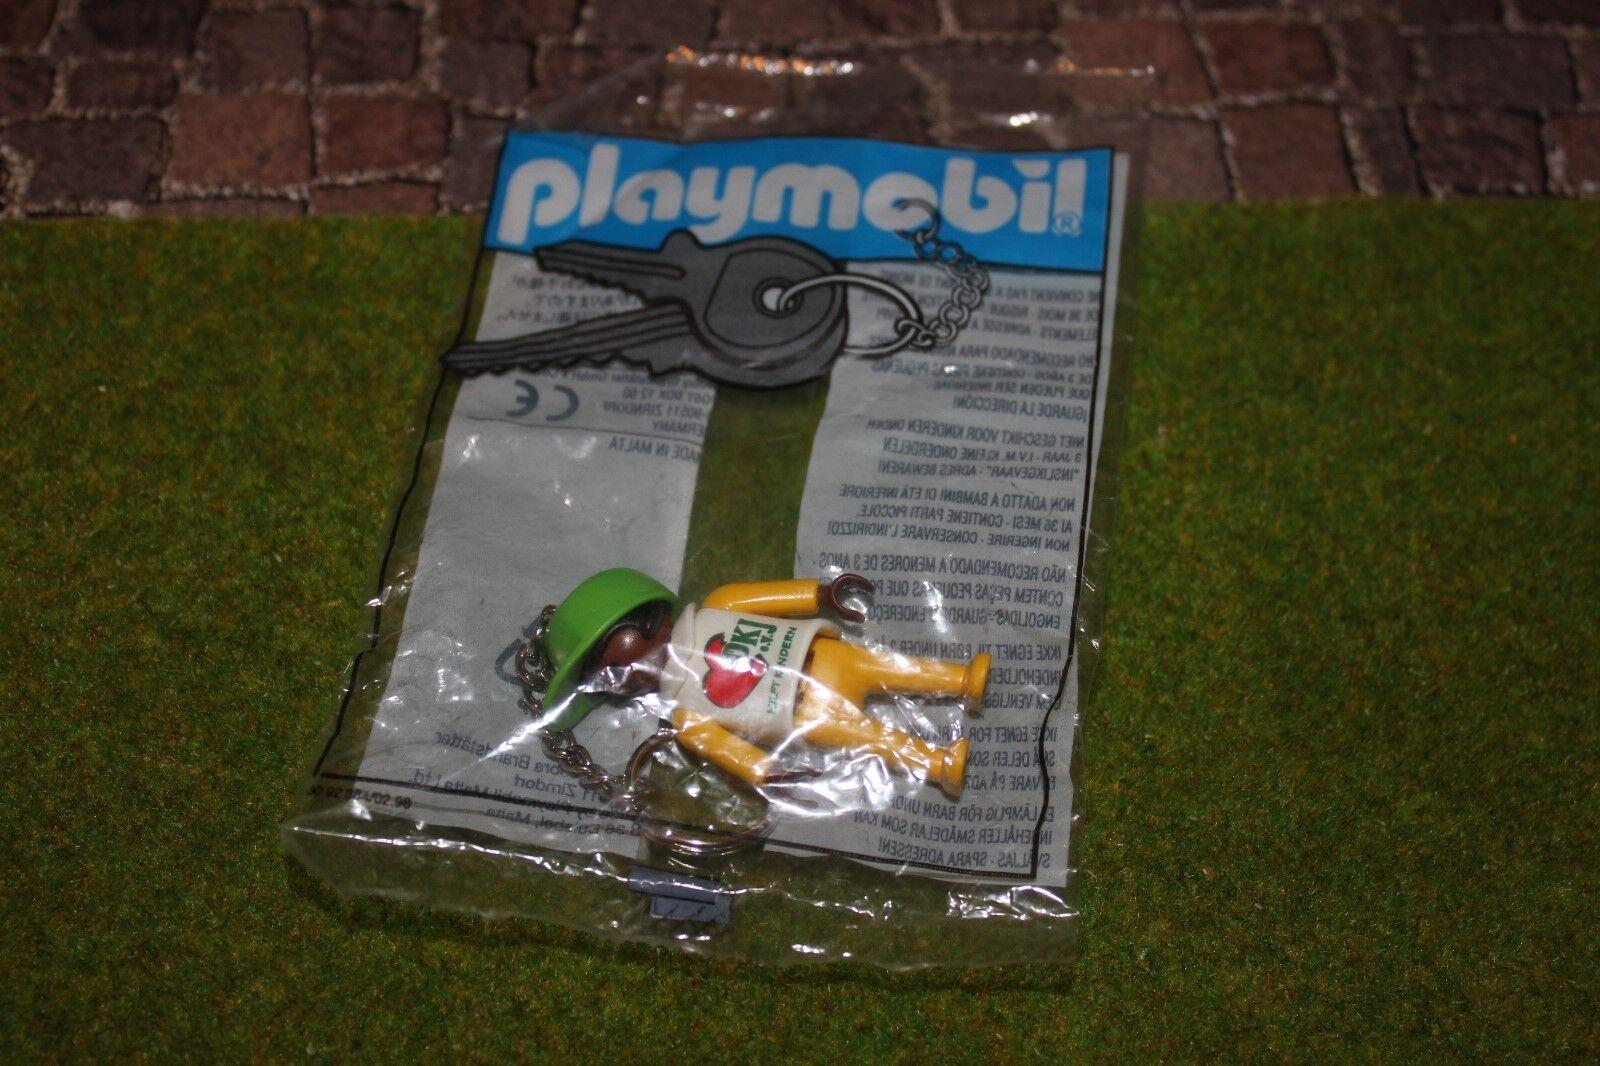 Playmobil Porte-Clés Djk Promo Figurine de Publicité Neuf   Embal. Origine